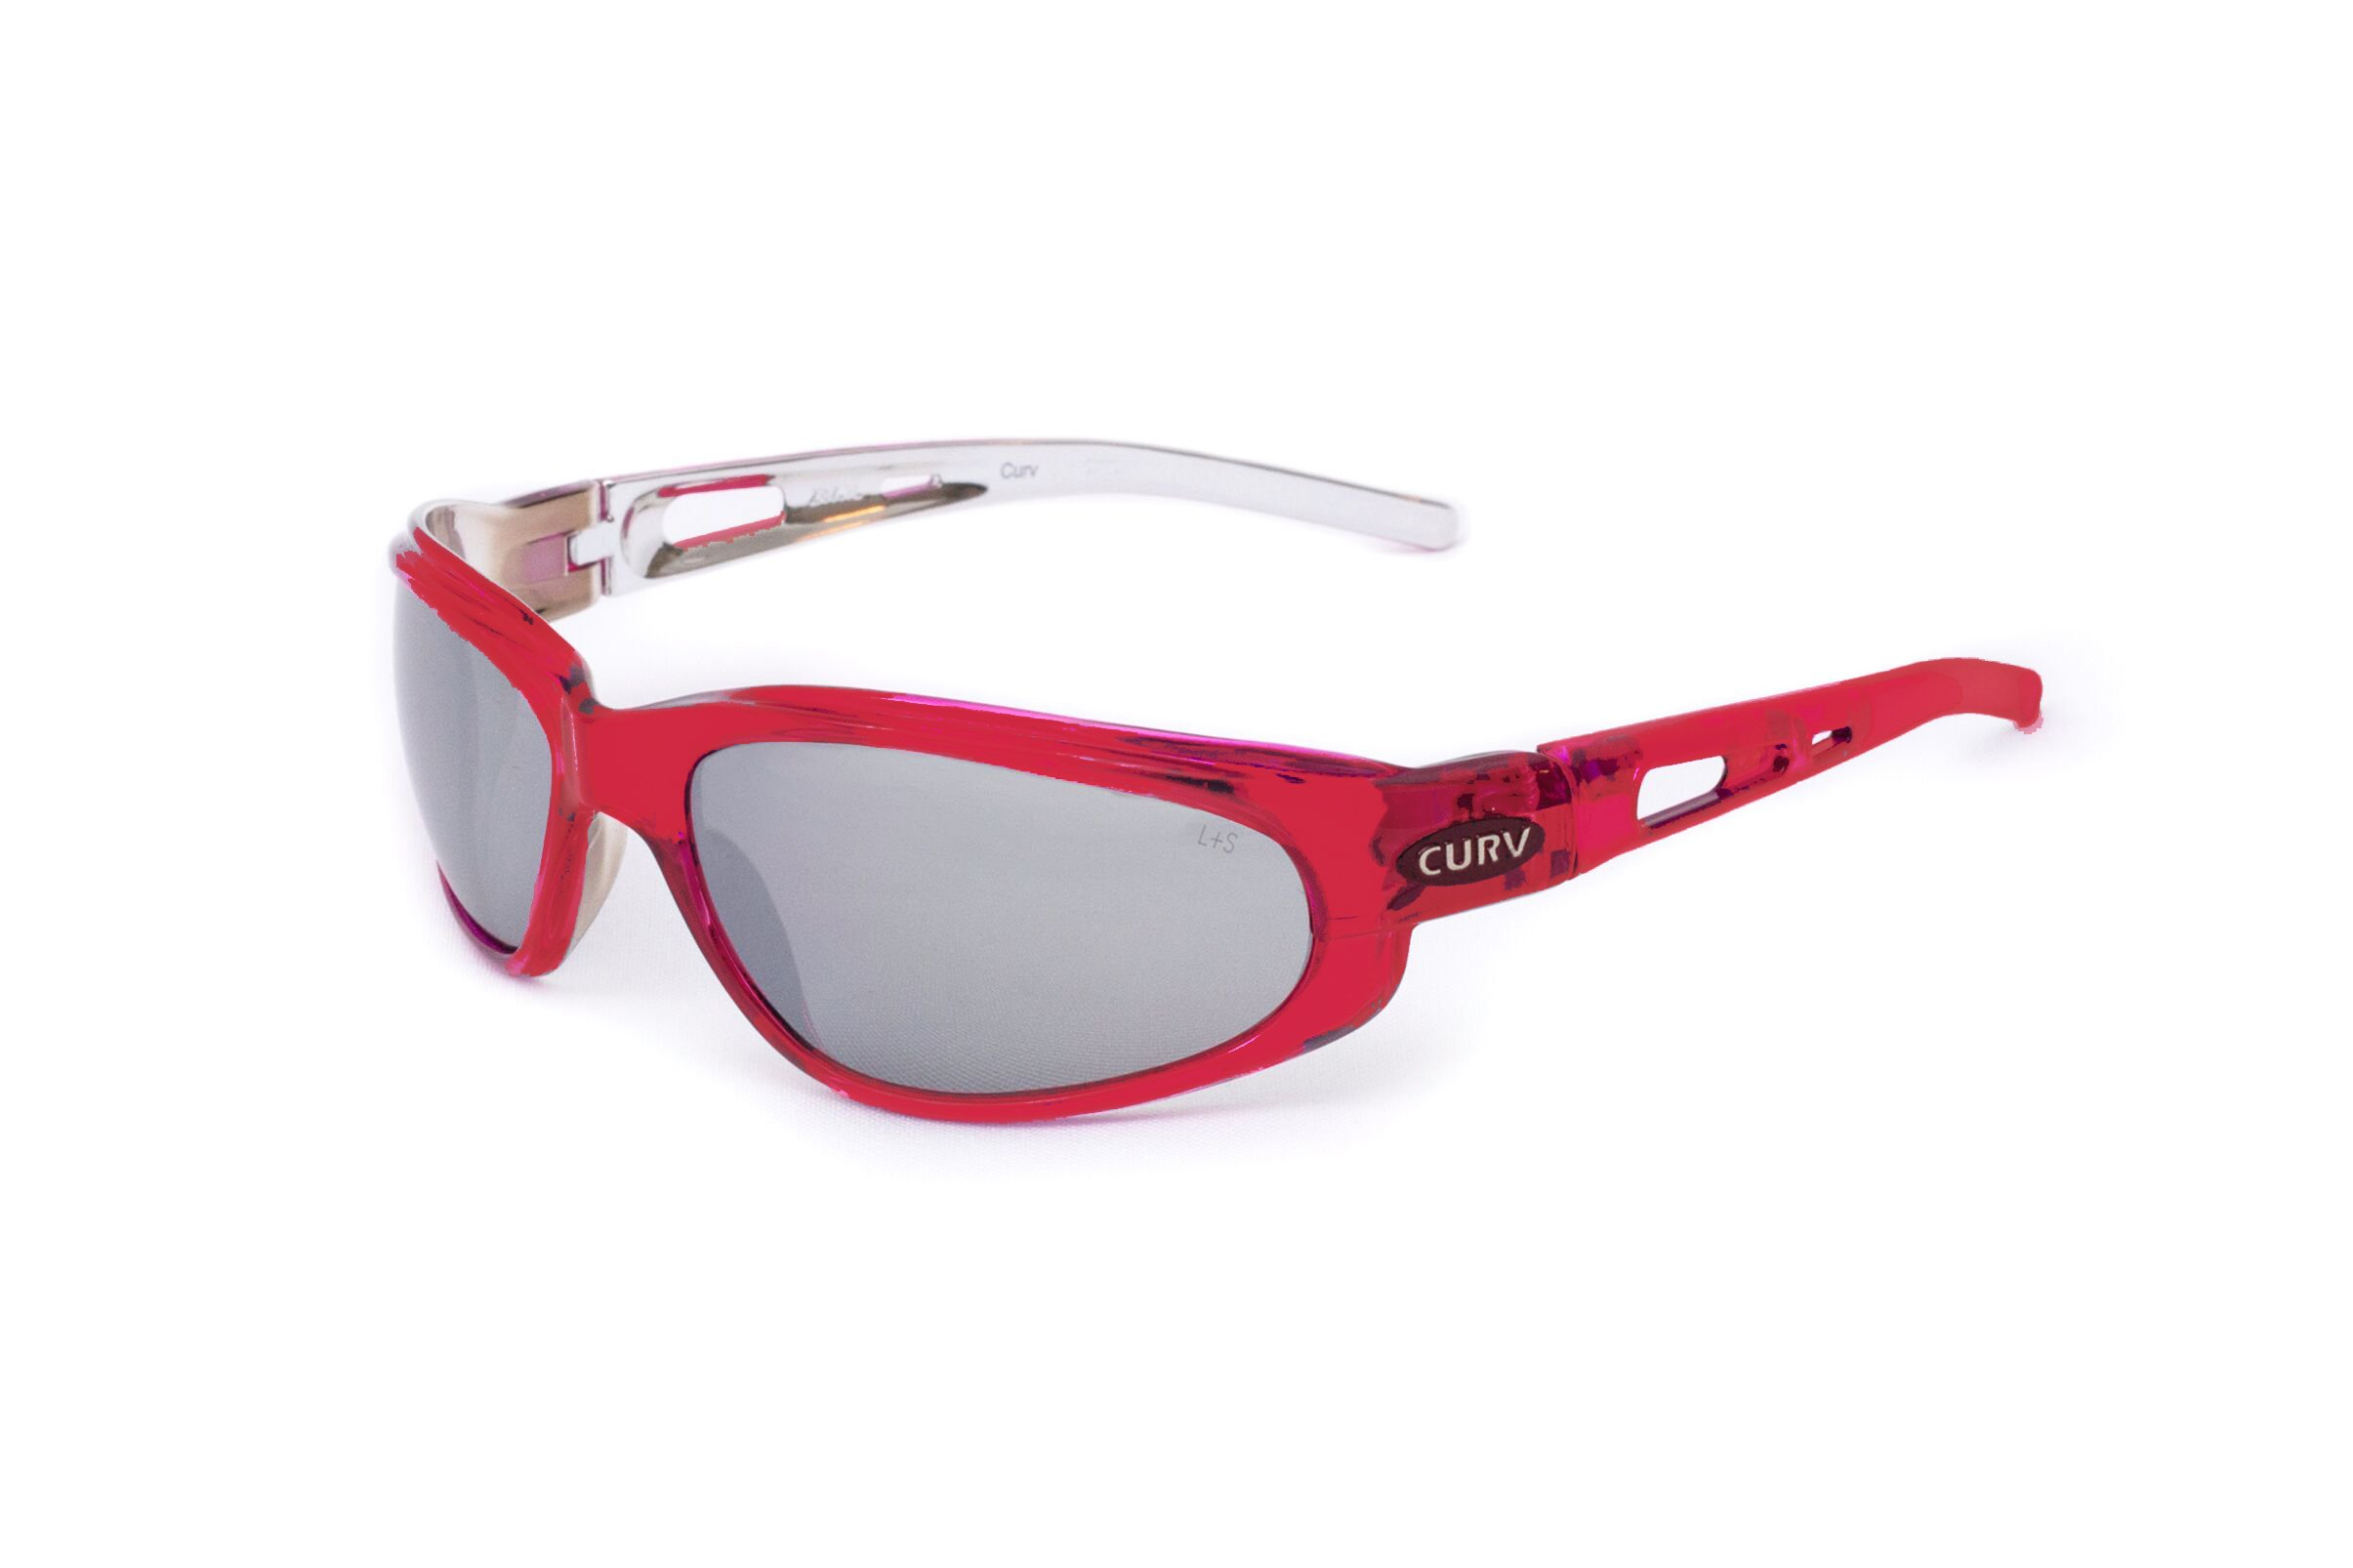 01-83 Curv Crystal Red Sunglasses